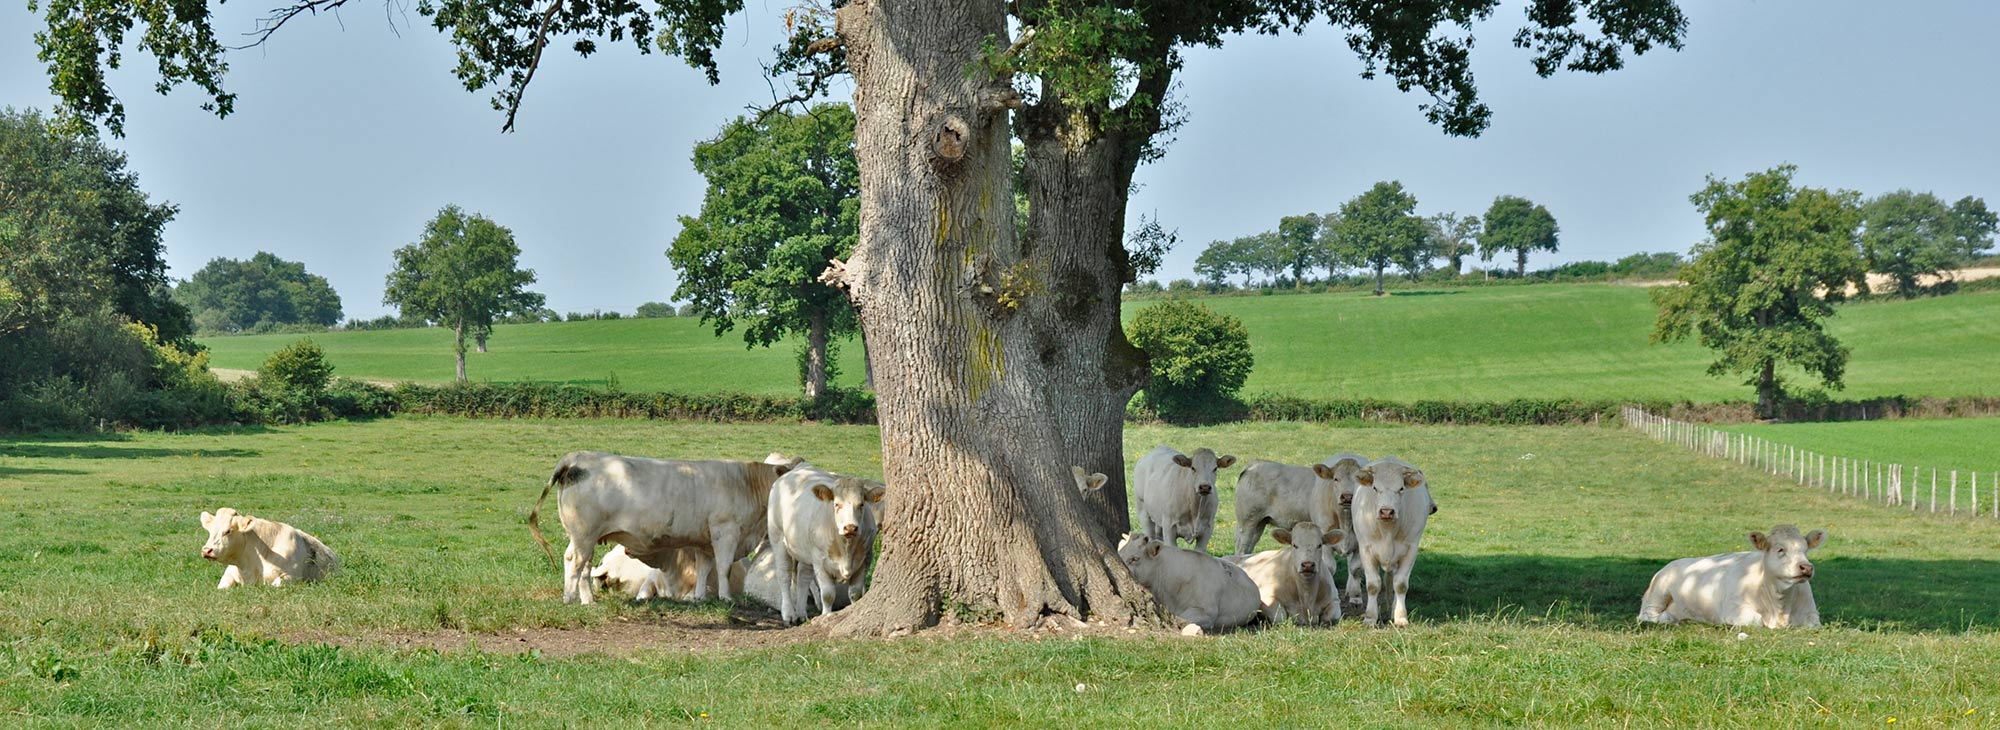 pastorale - omgeving - Brenazet -foto Connie Dekker